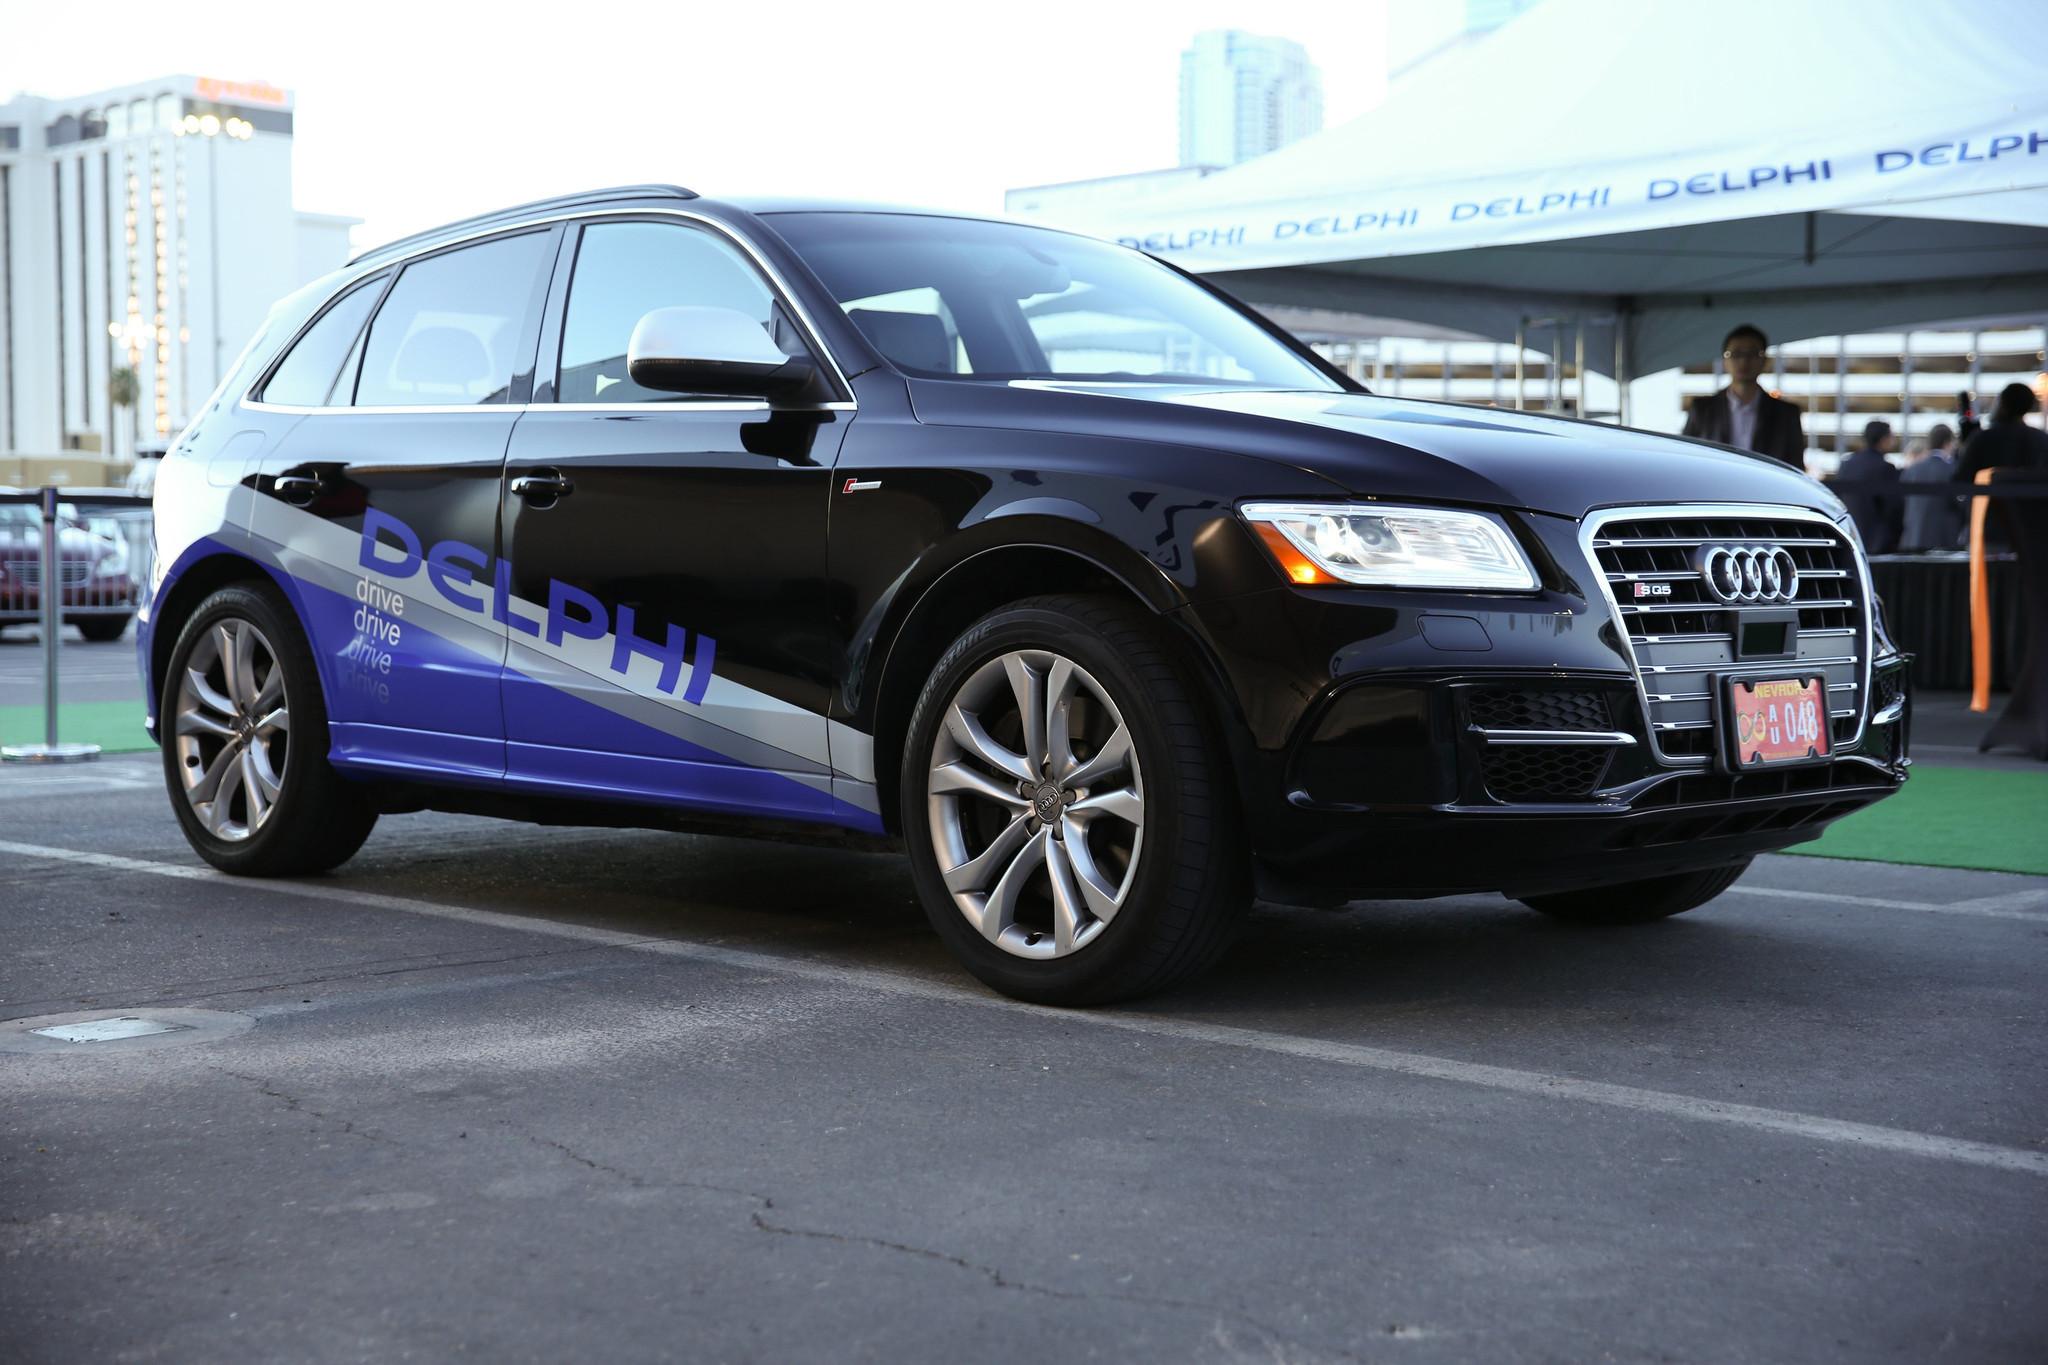 Audi And Delphi Launch First Coasttocoast Driverless Auto - Audi driverless car